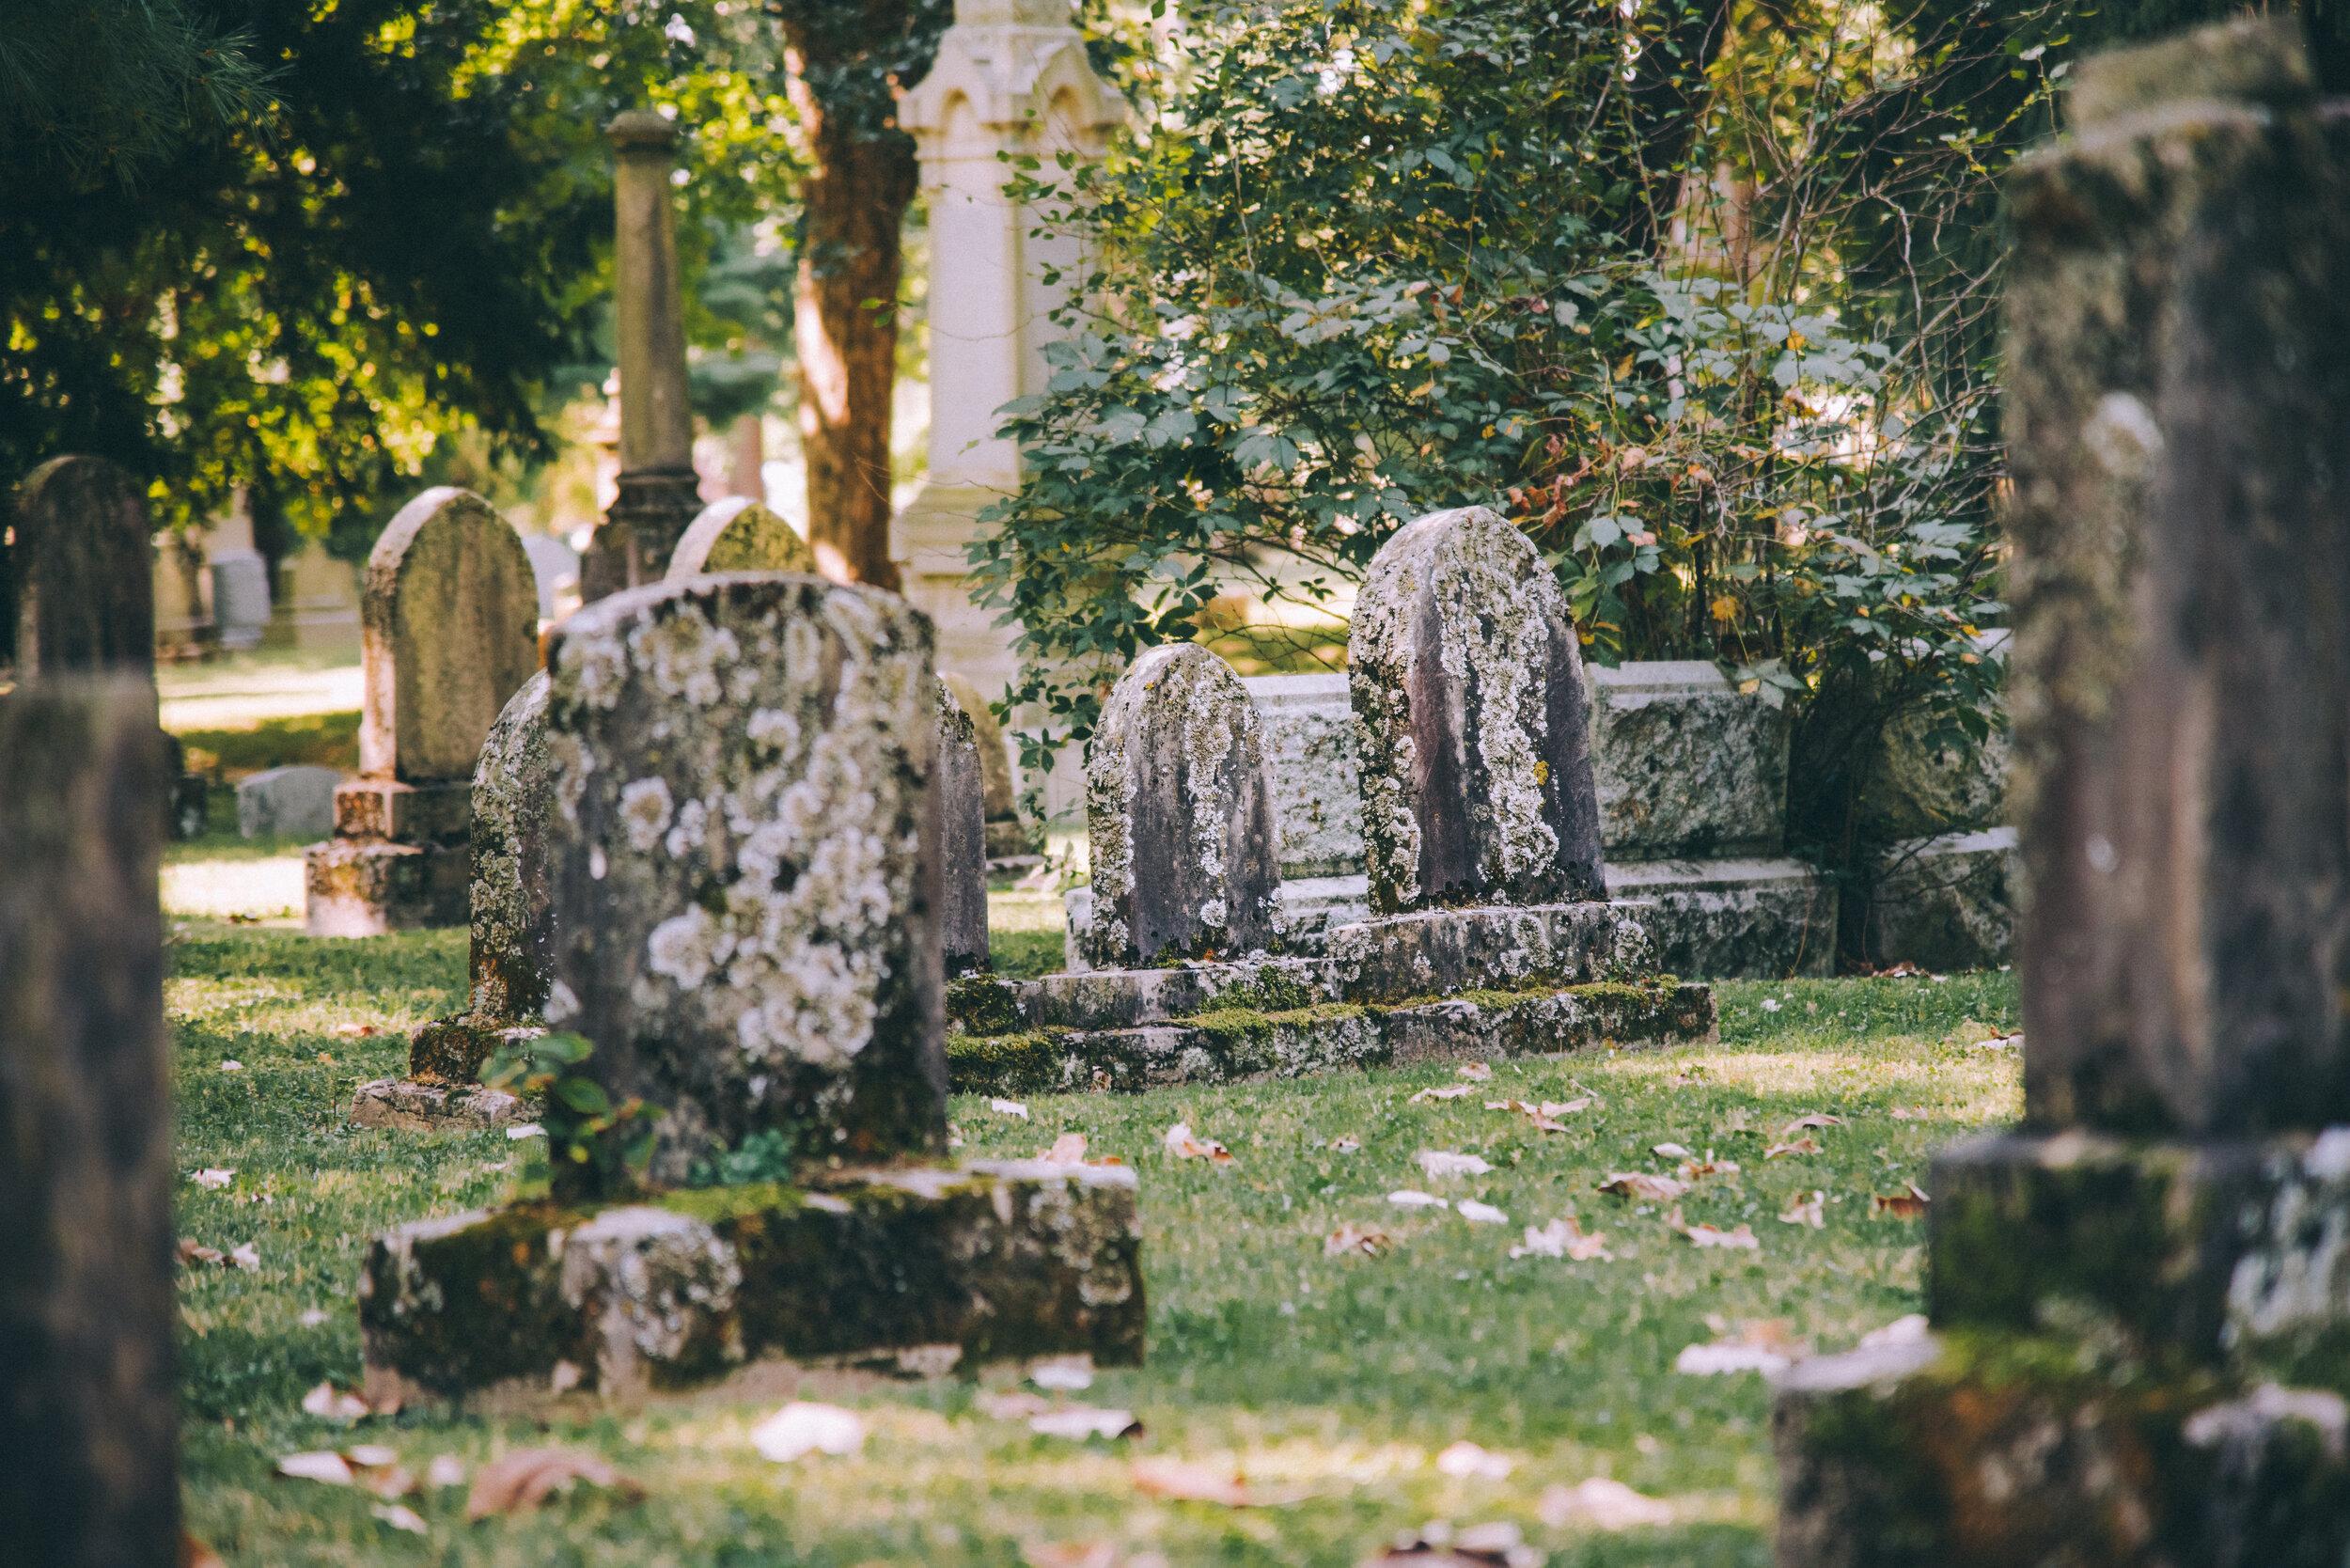 kw-lexington-cemetery-img1.jpg